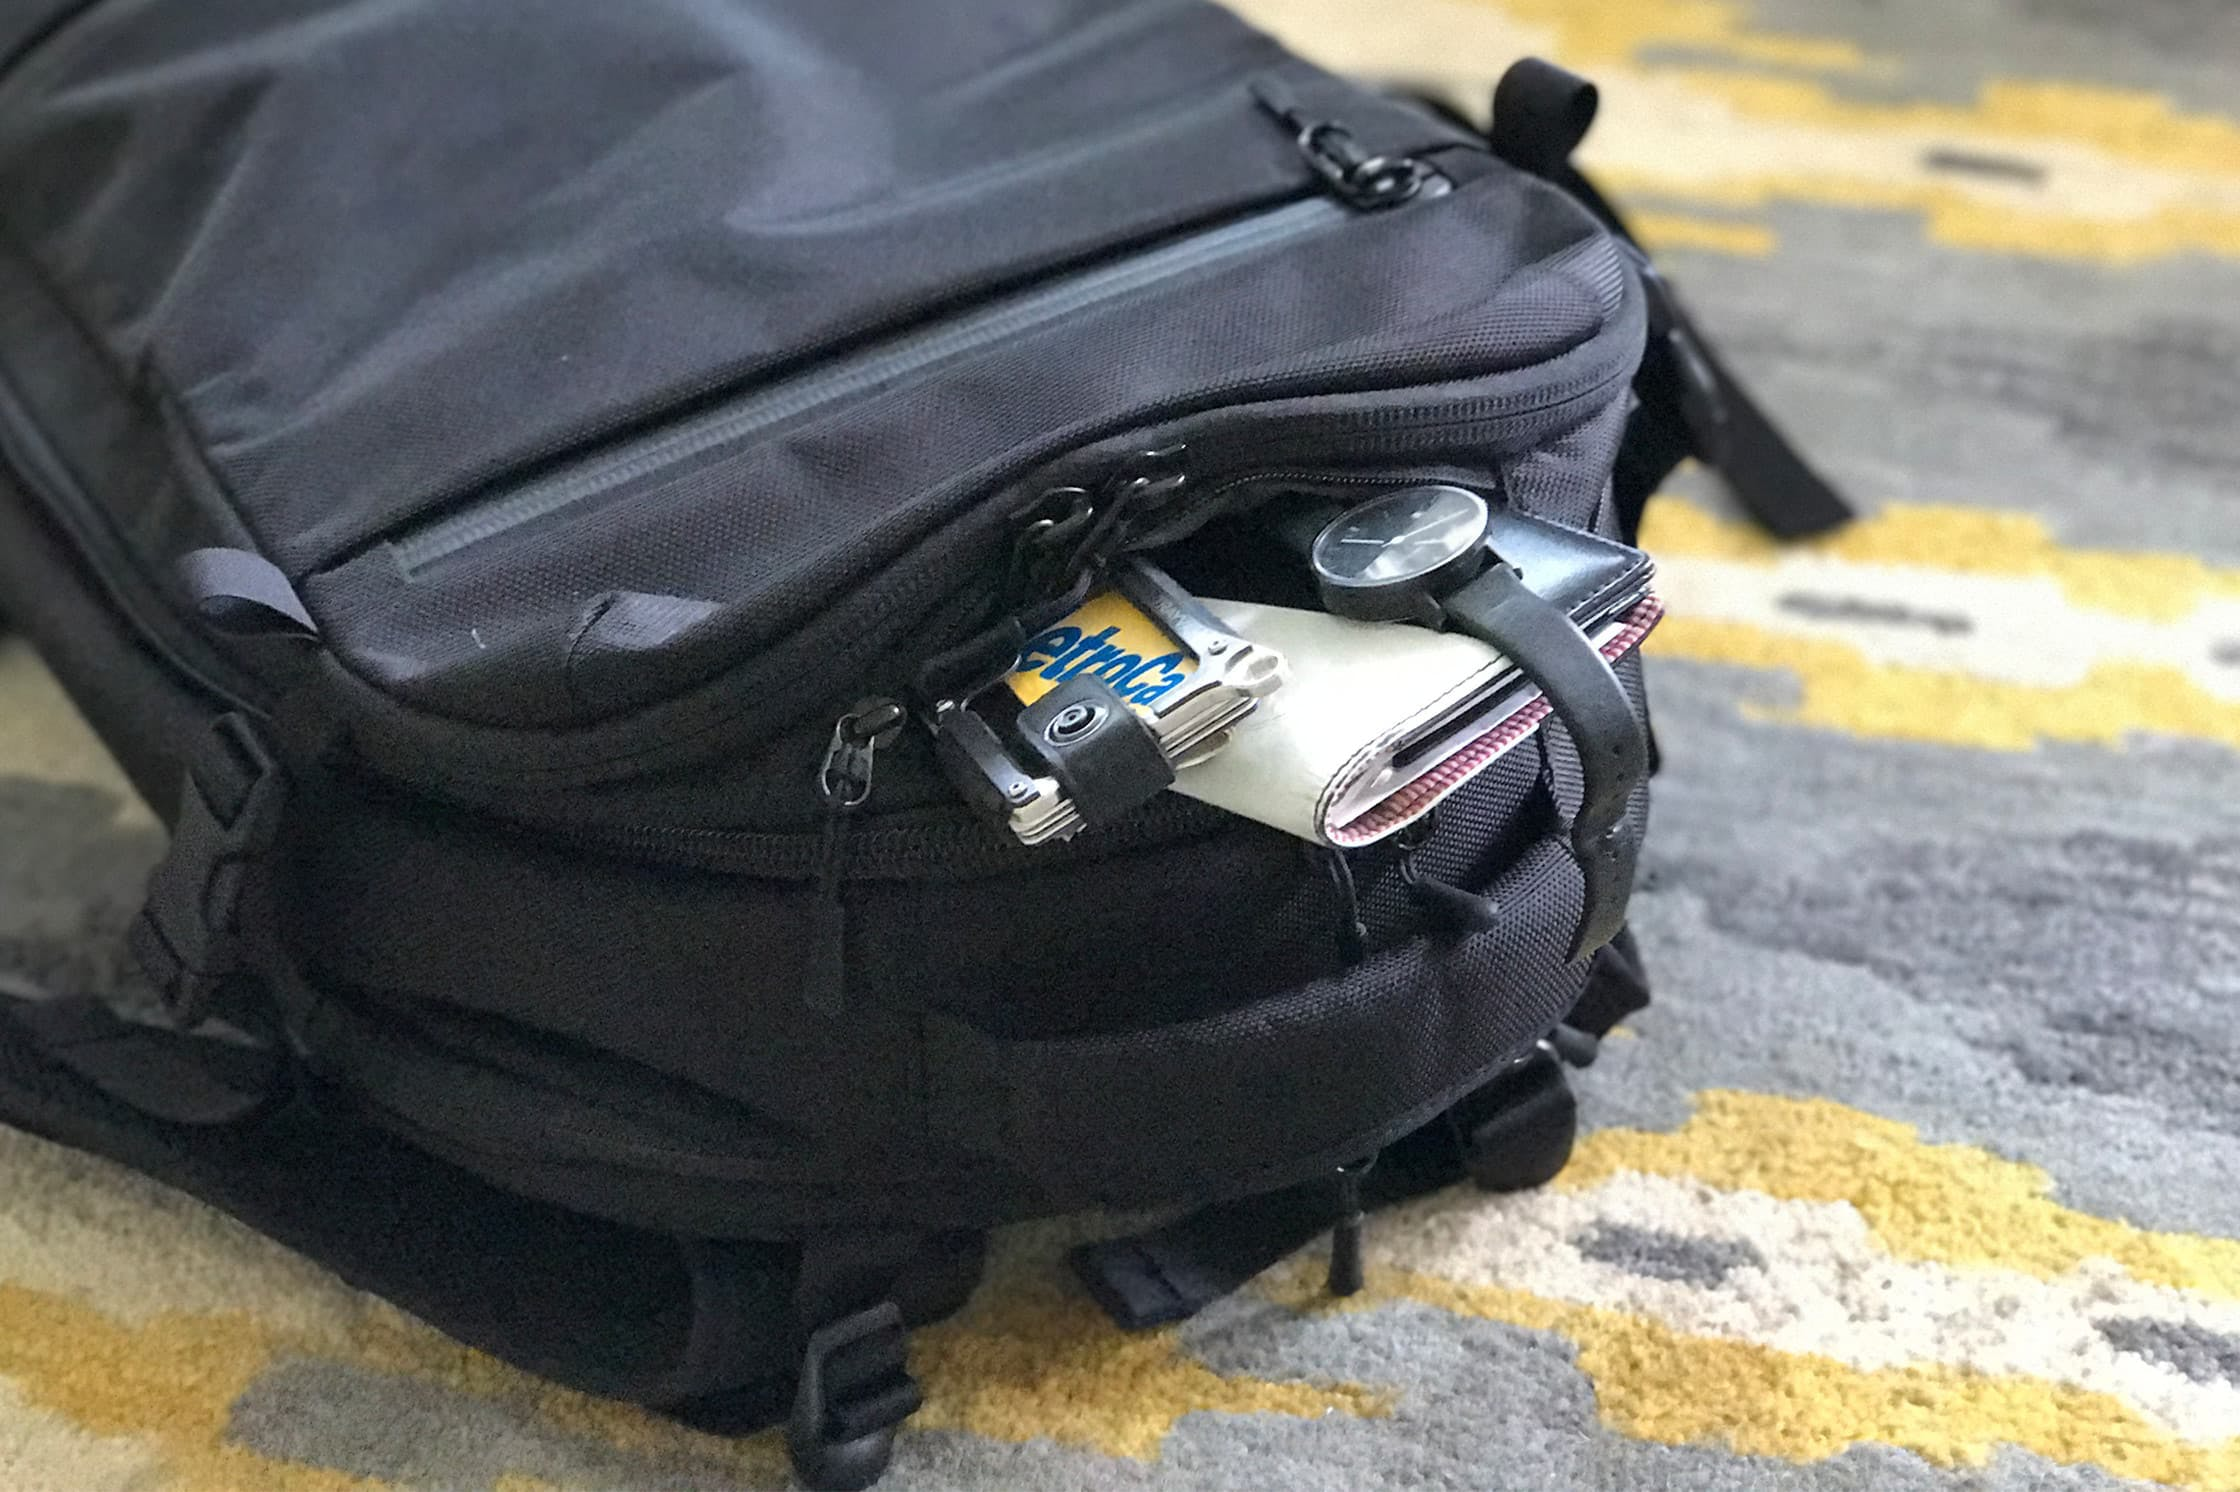 Aer Travel Pack Padded Top Pocket